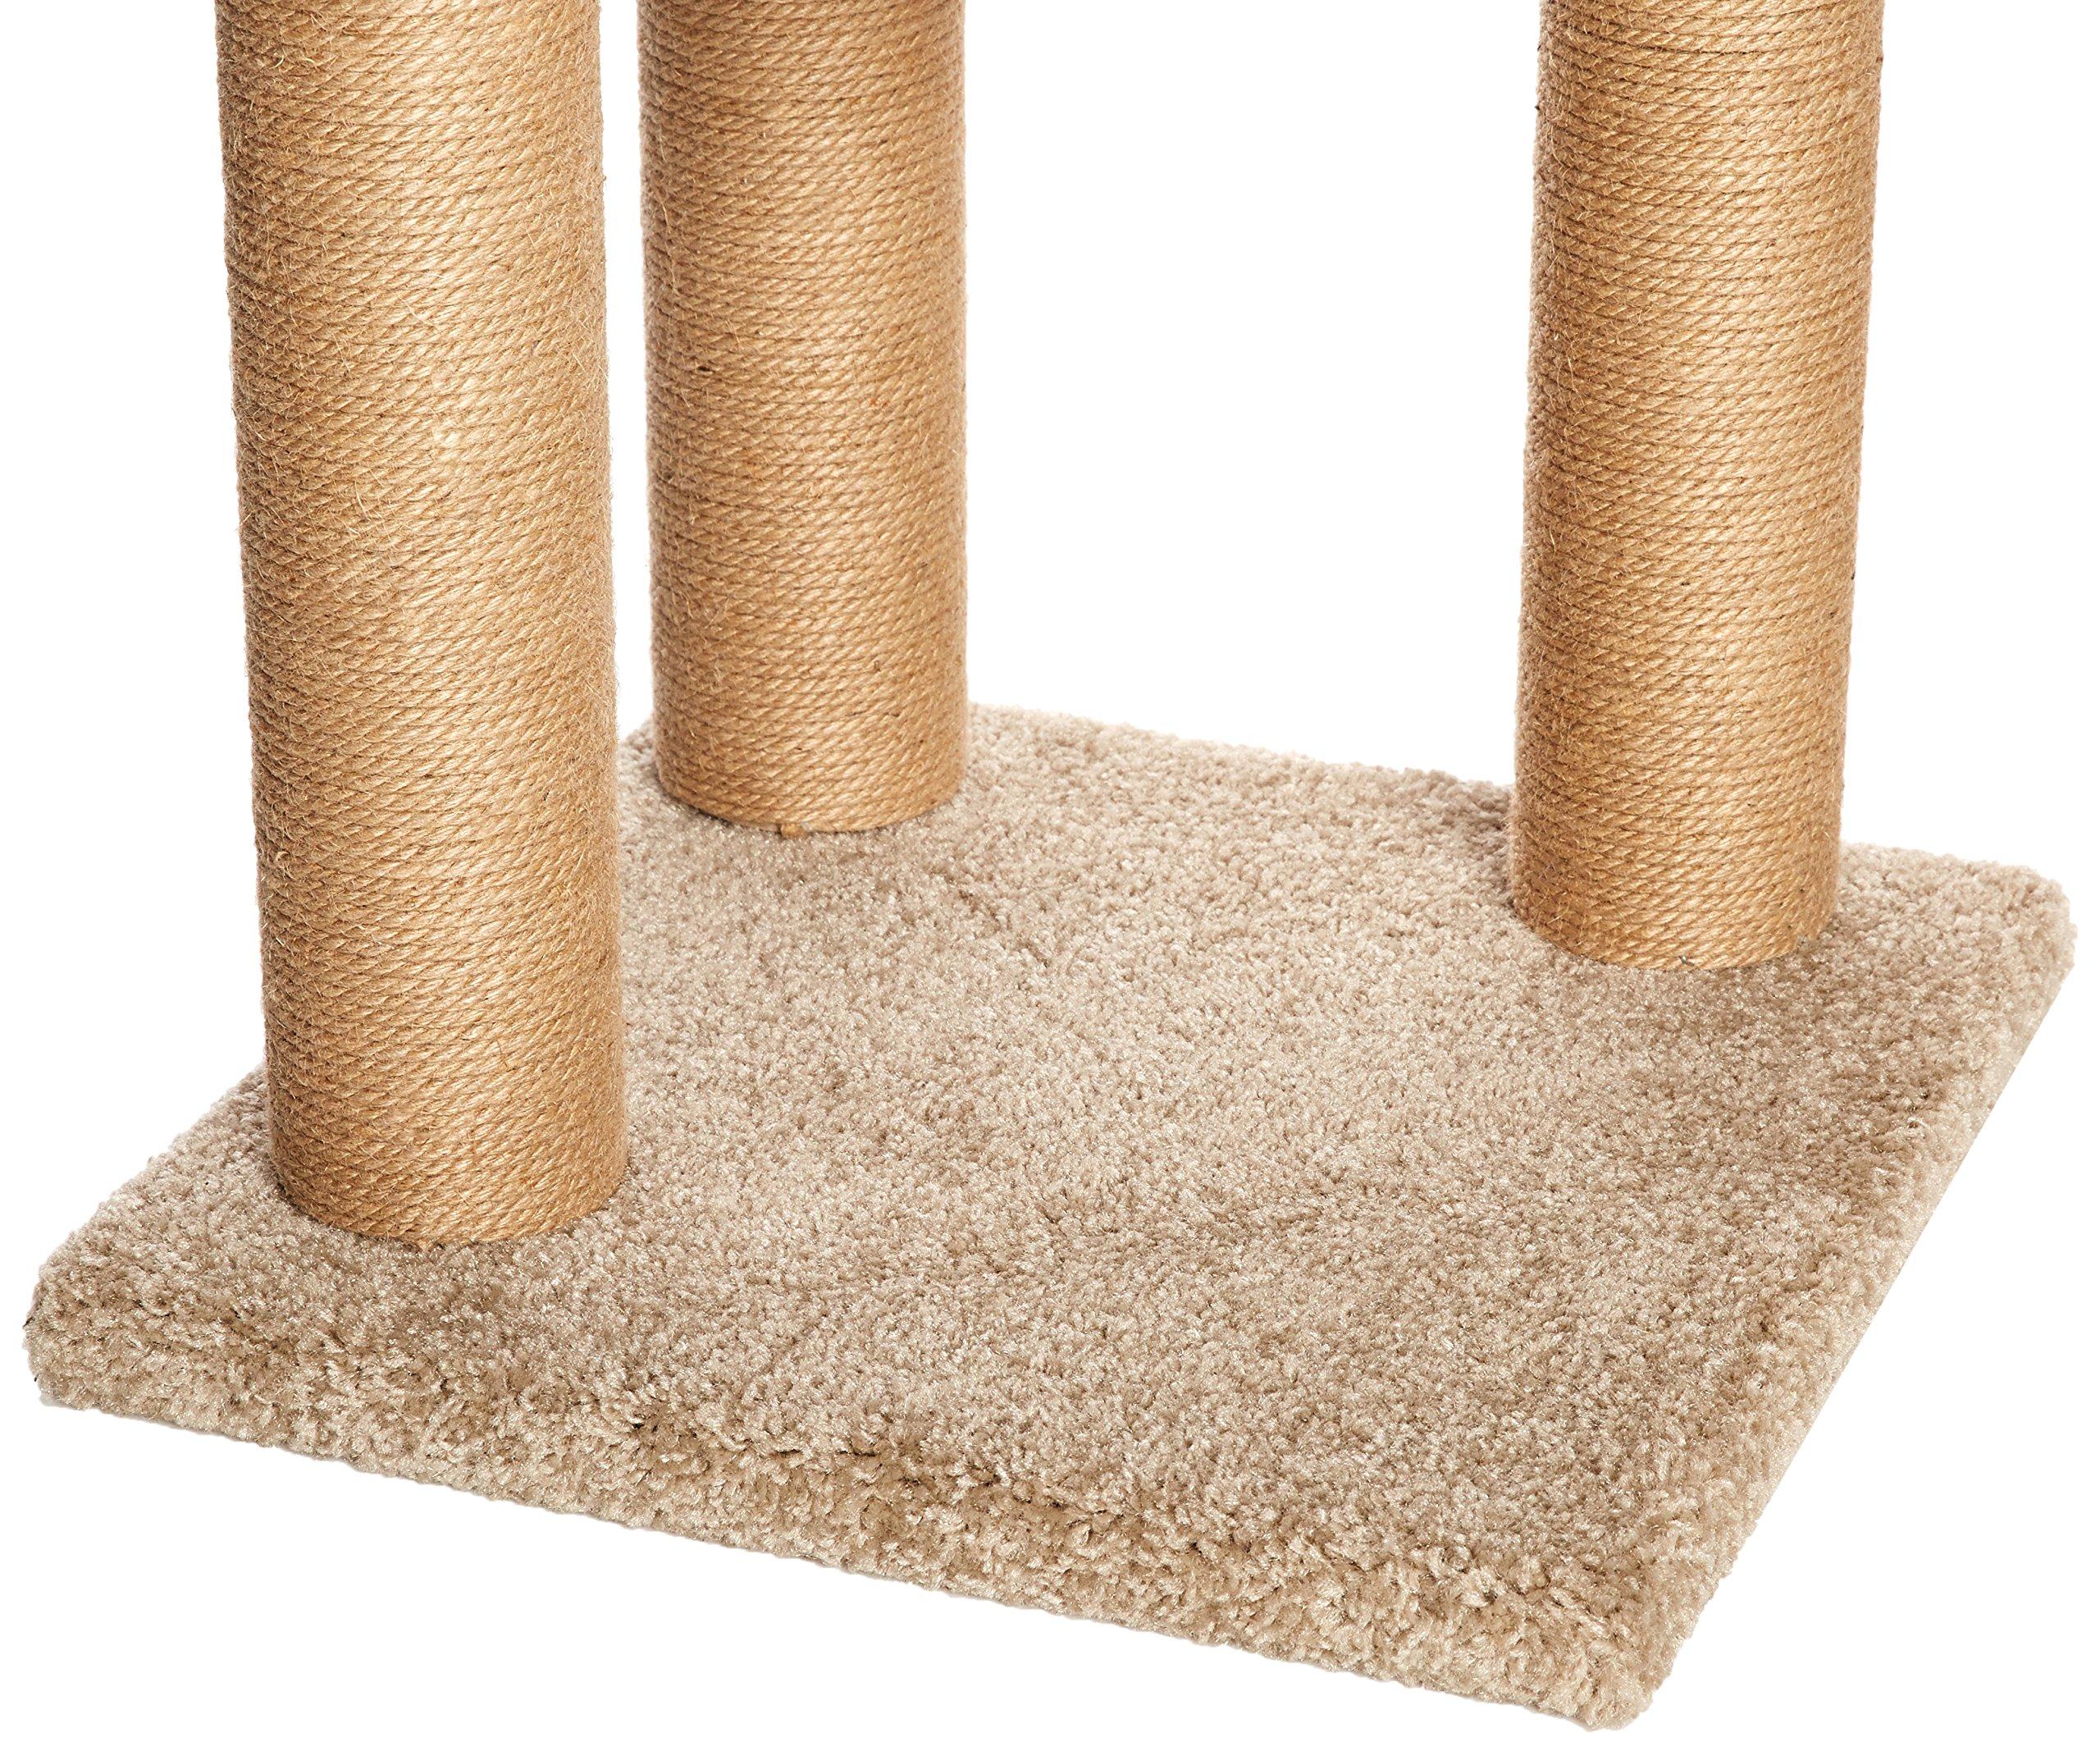 AmazonBasics Cat Activity Tree with Scratching Posts 4